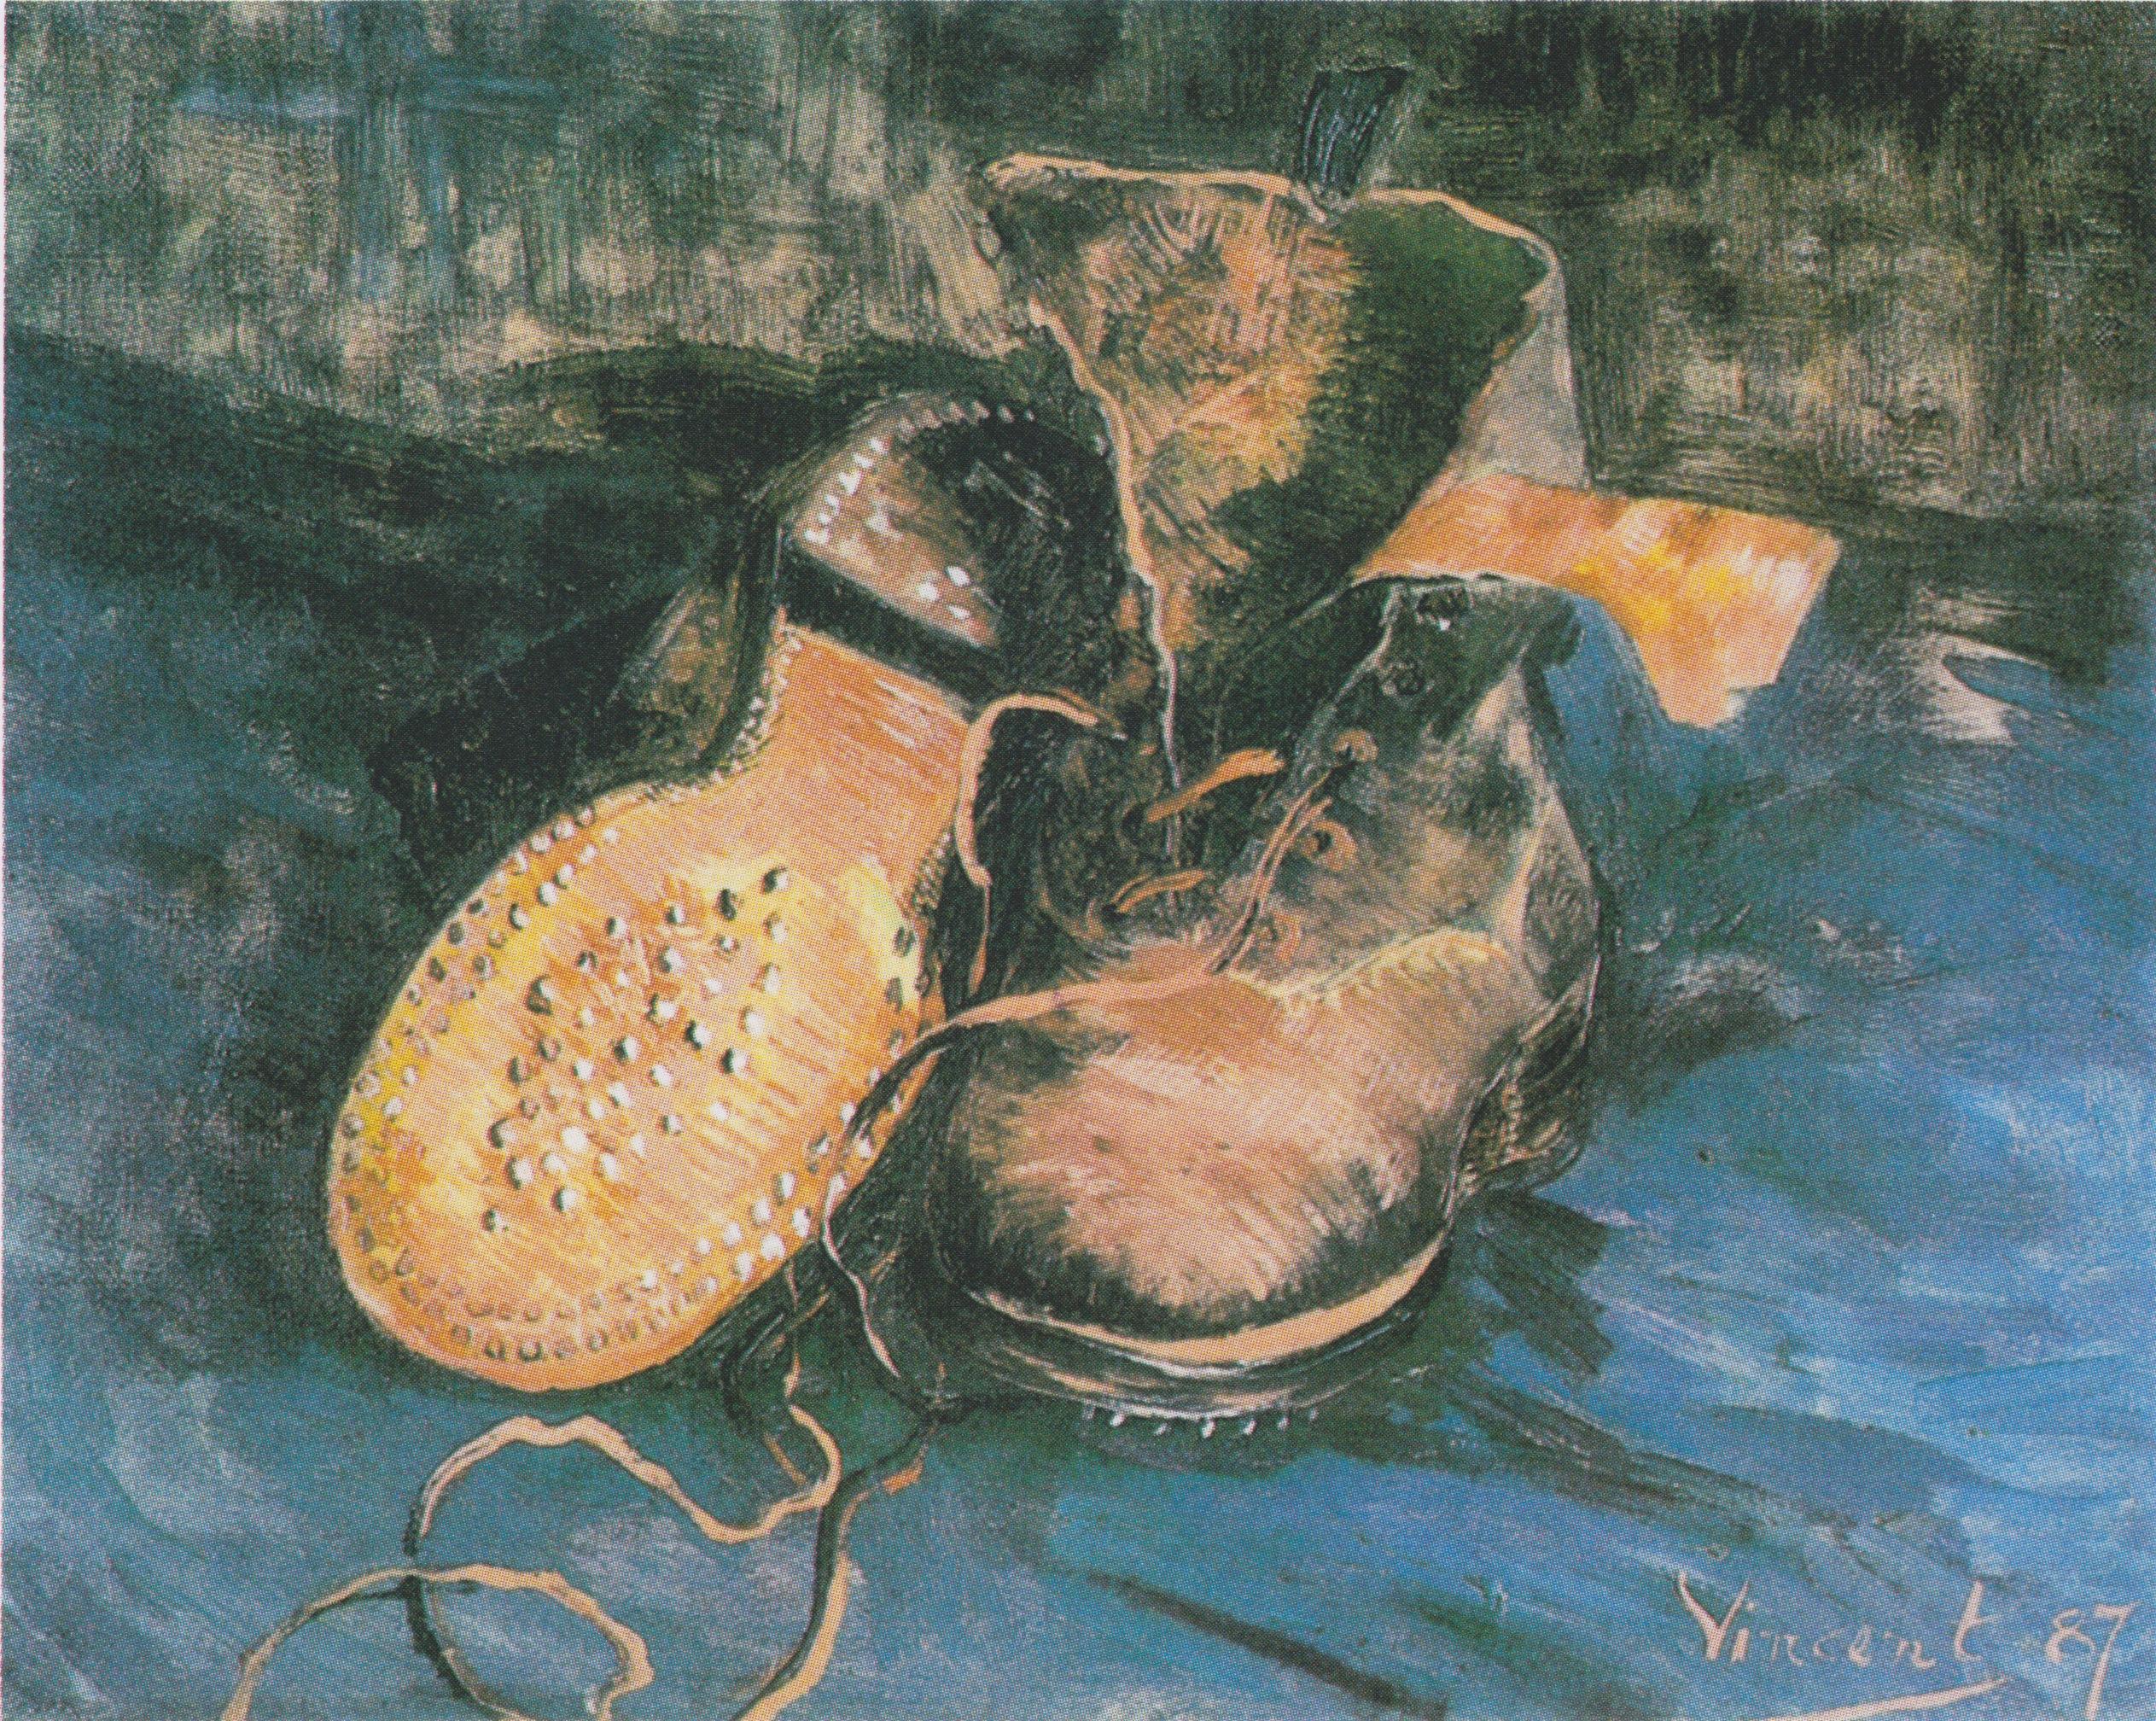 Paar Wikipedia Datei van – Gogh Ein Schuhe1 jpeg CBoerdxW